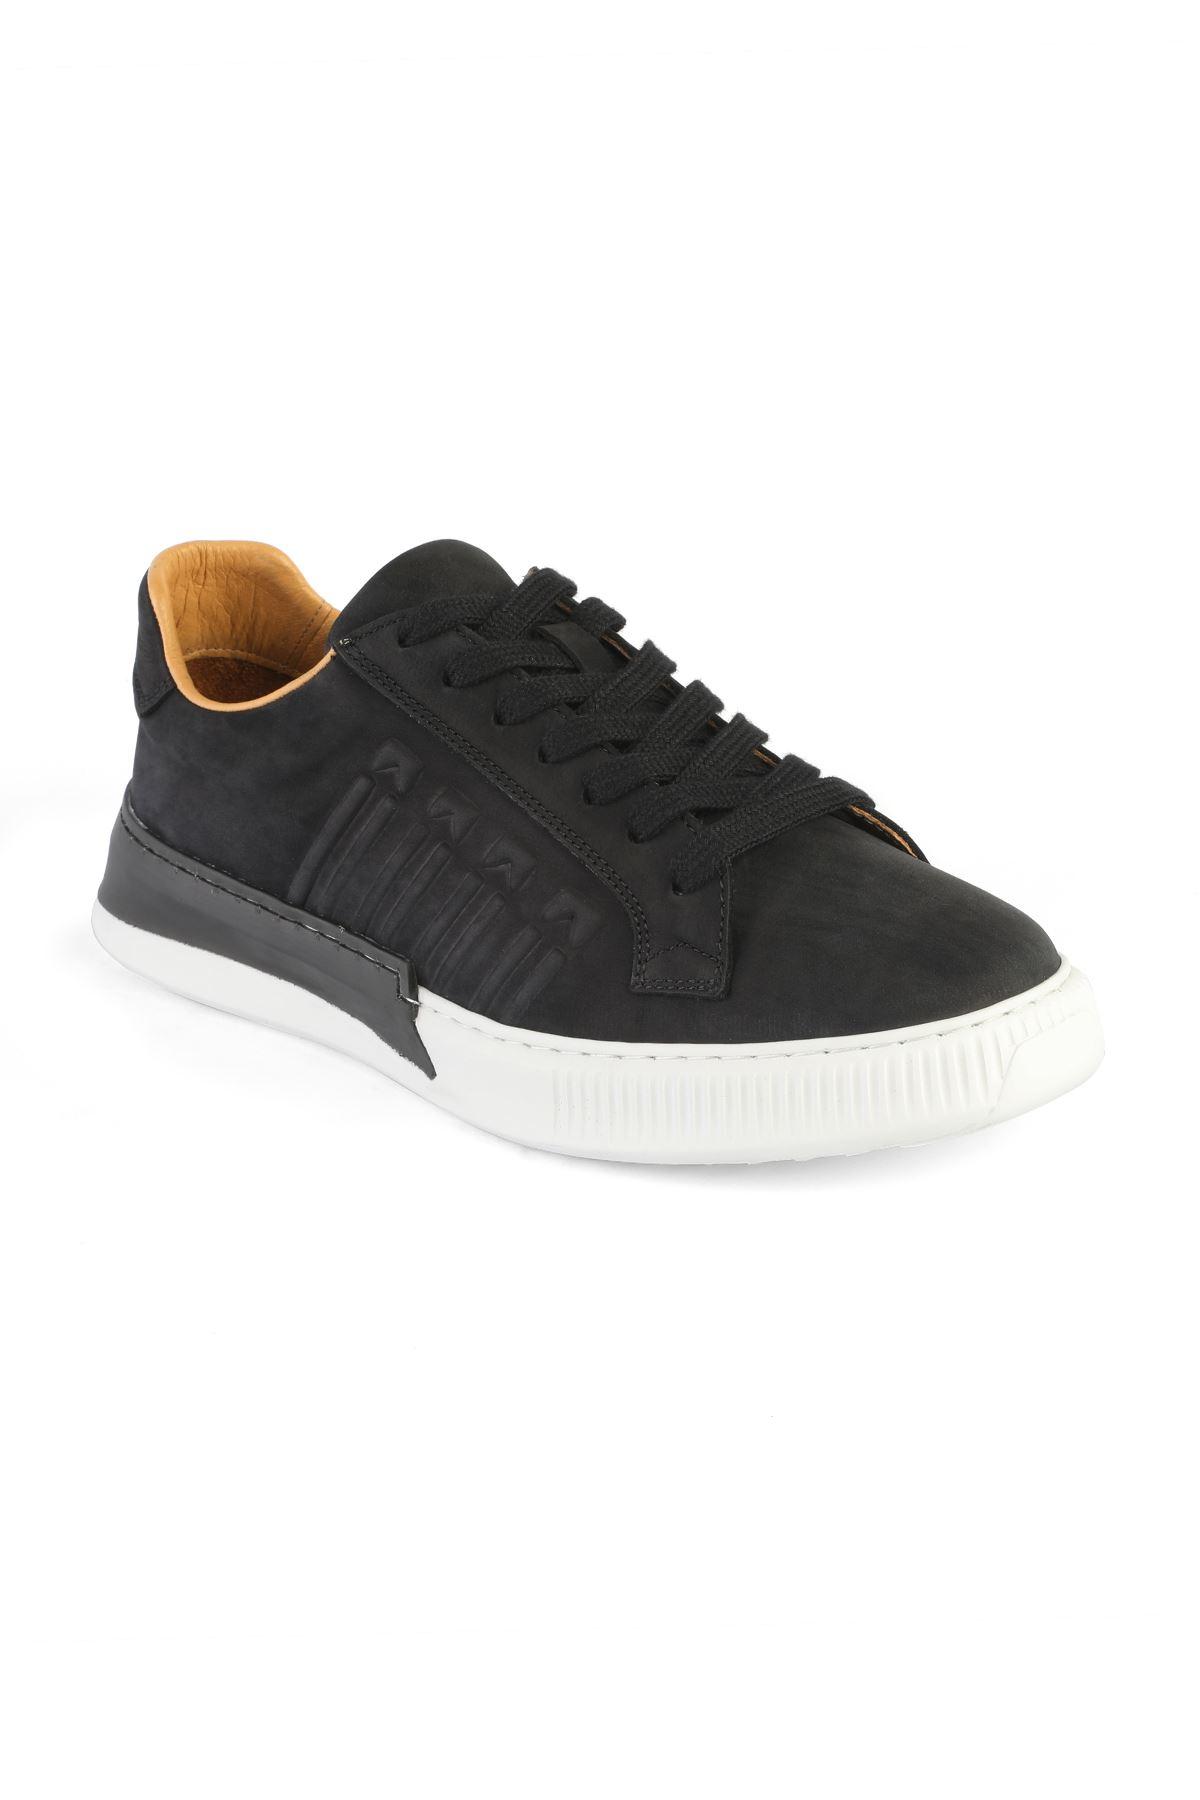 Libero 3438 Black Casual Shoes